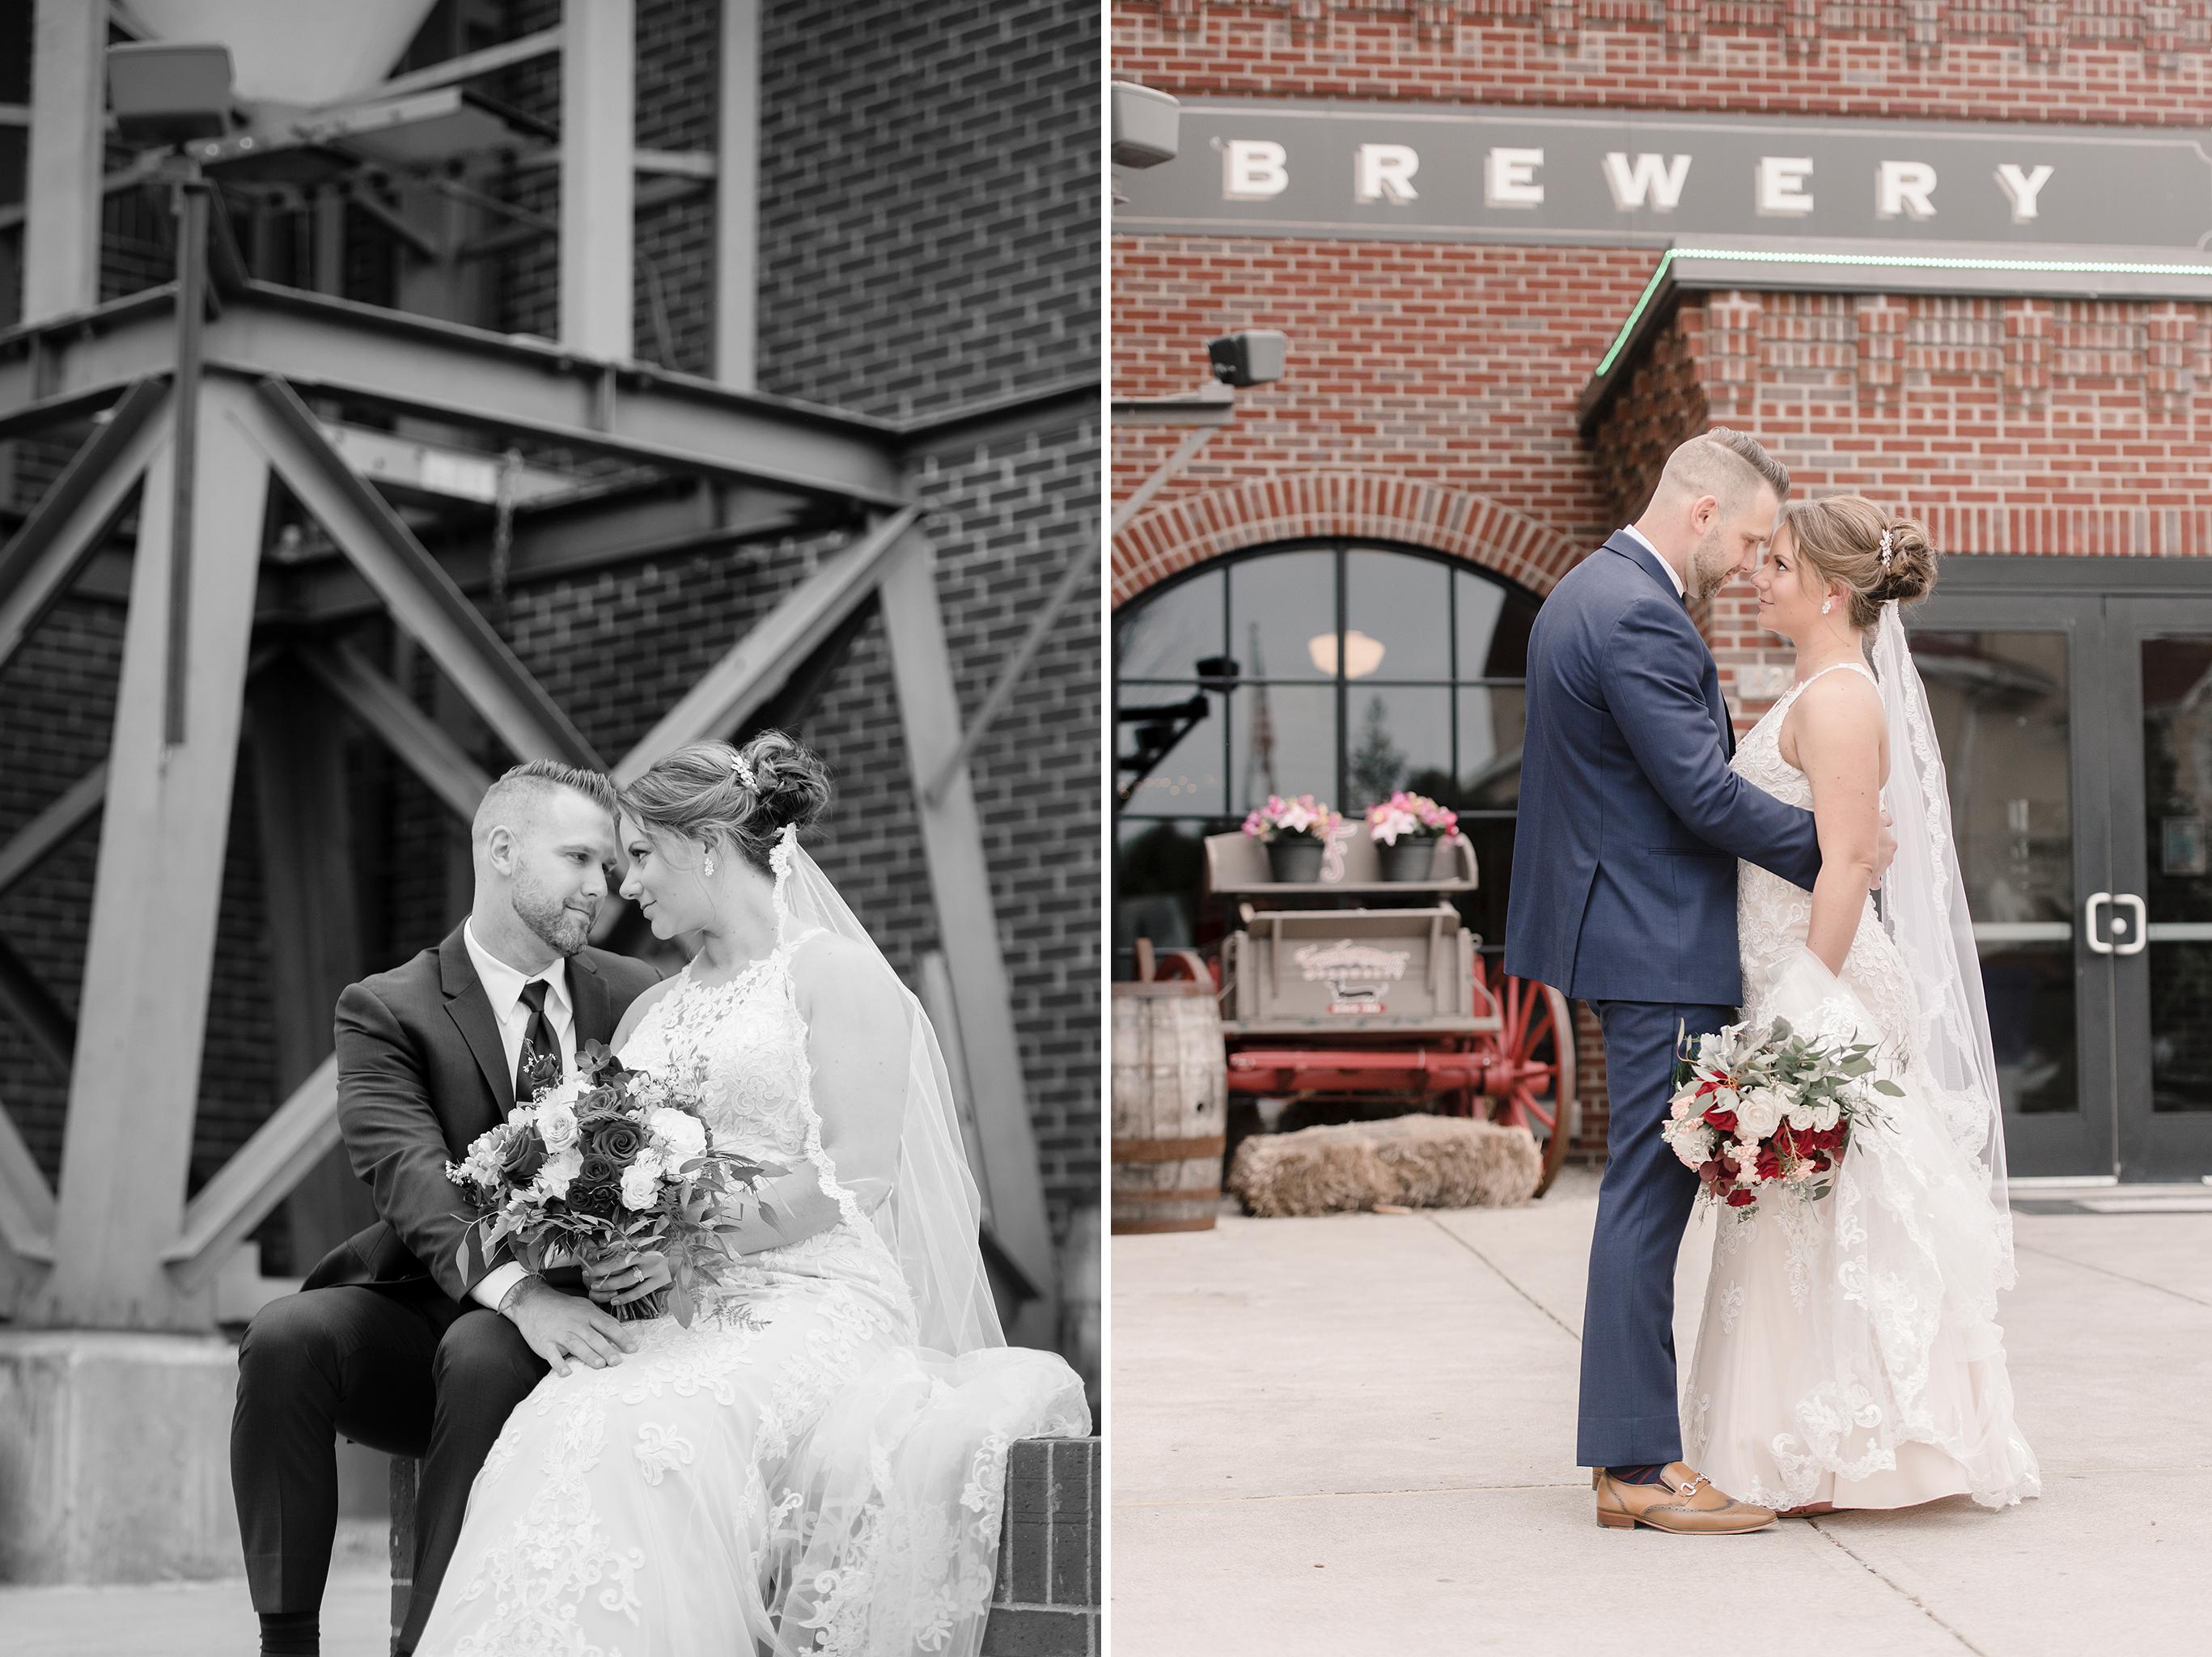 LINDSAY-ADKINS-PHOTOGRAPHY-MICHIGAN-WEDDING-PHOTOGRAPHER-FRANKENMUTH-BREWERY-WEDDING-MICHIGAN-BLOG-30